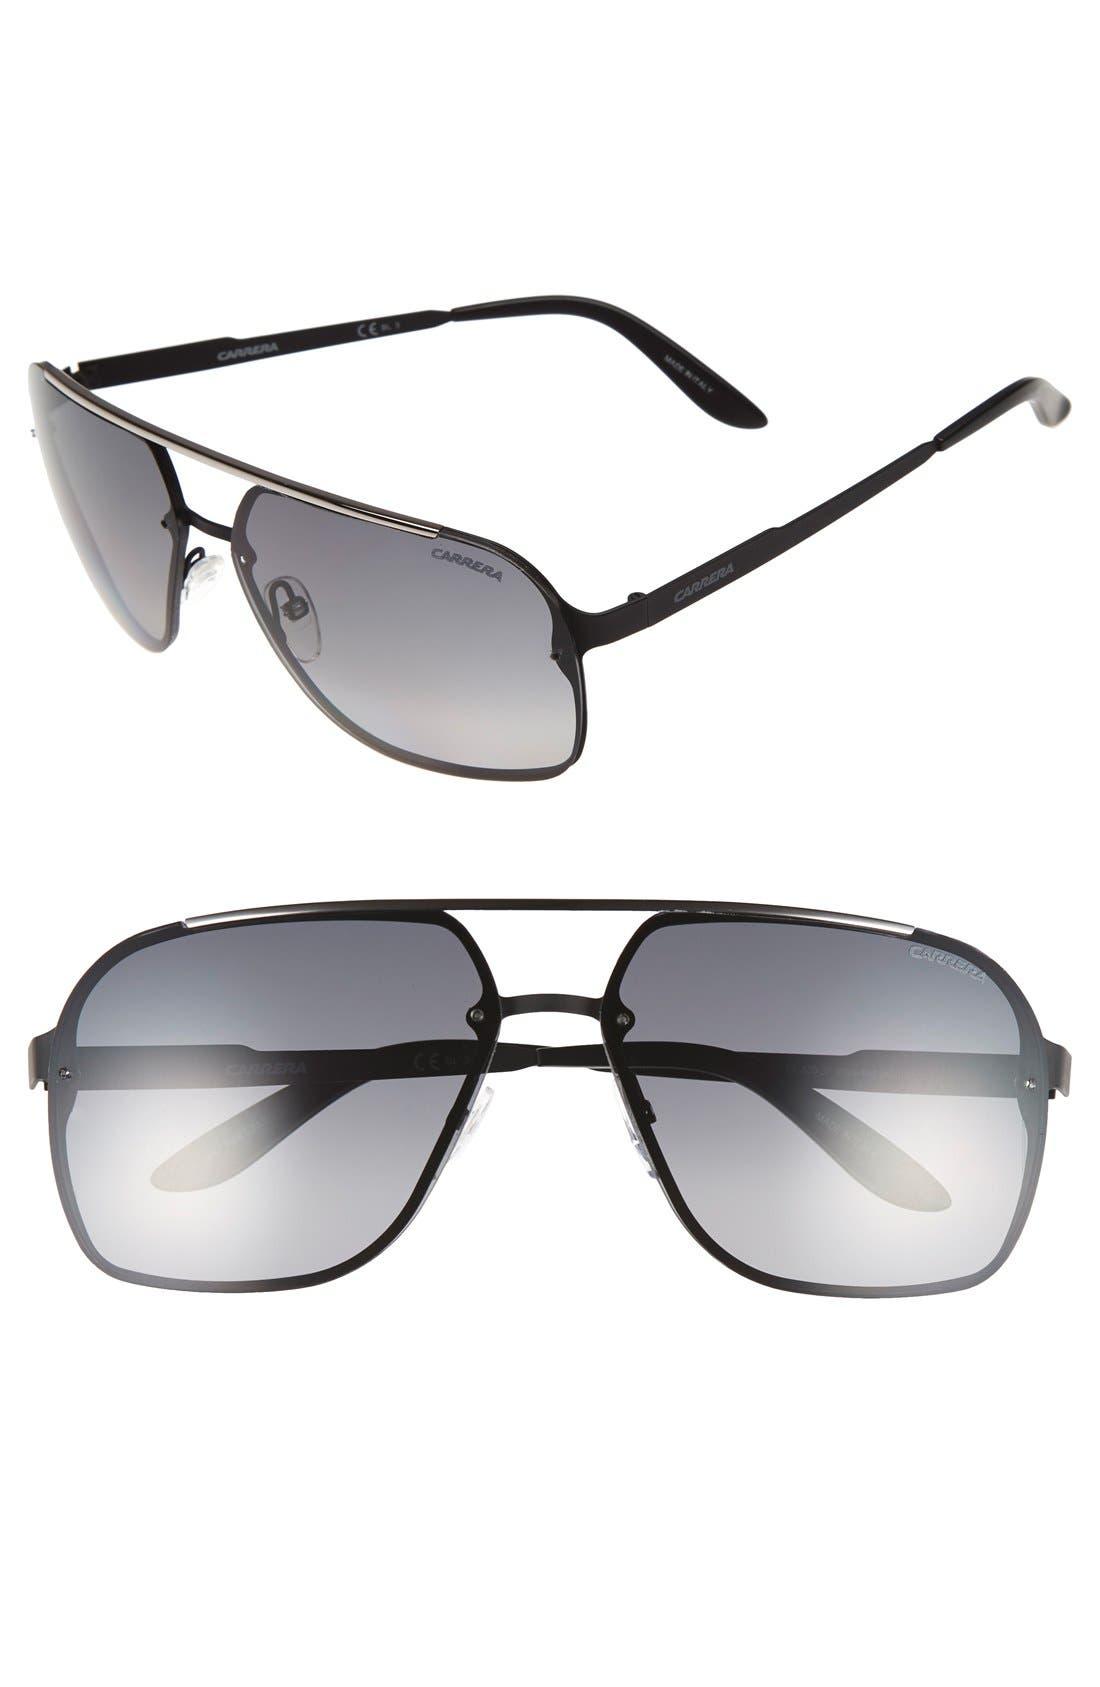 '91/S' 64mm Polarized Sunglasses,                             Main thumbnail 1, color,                             002